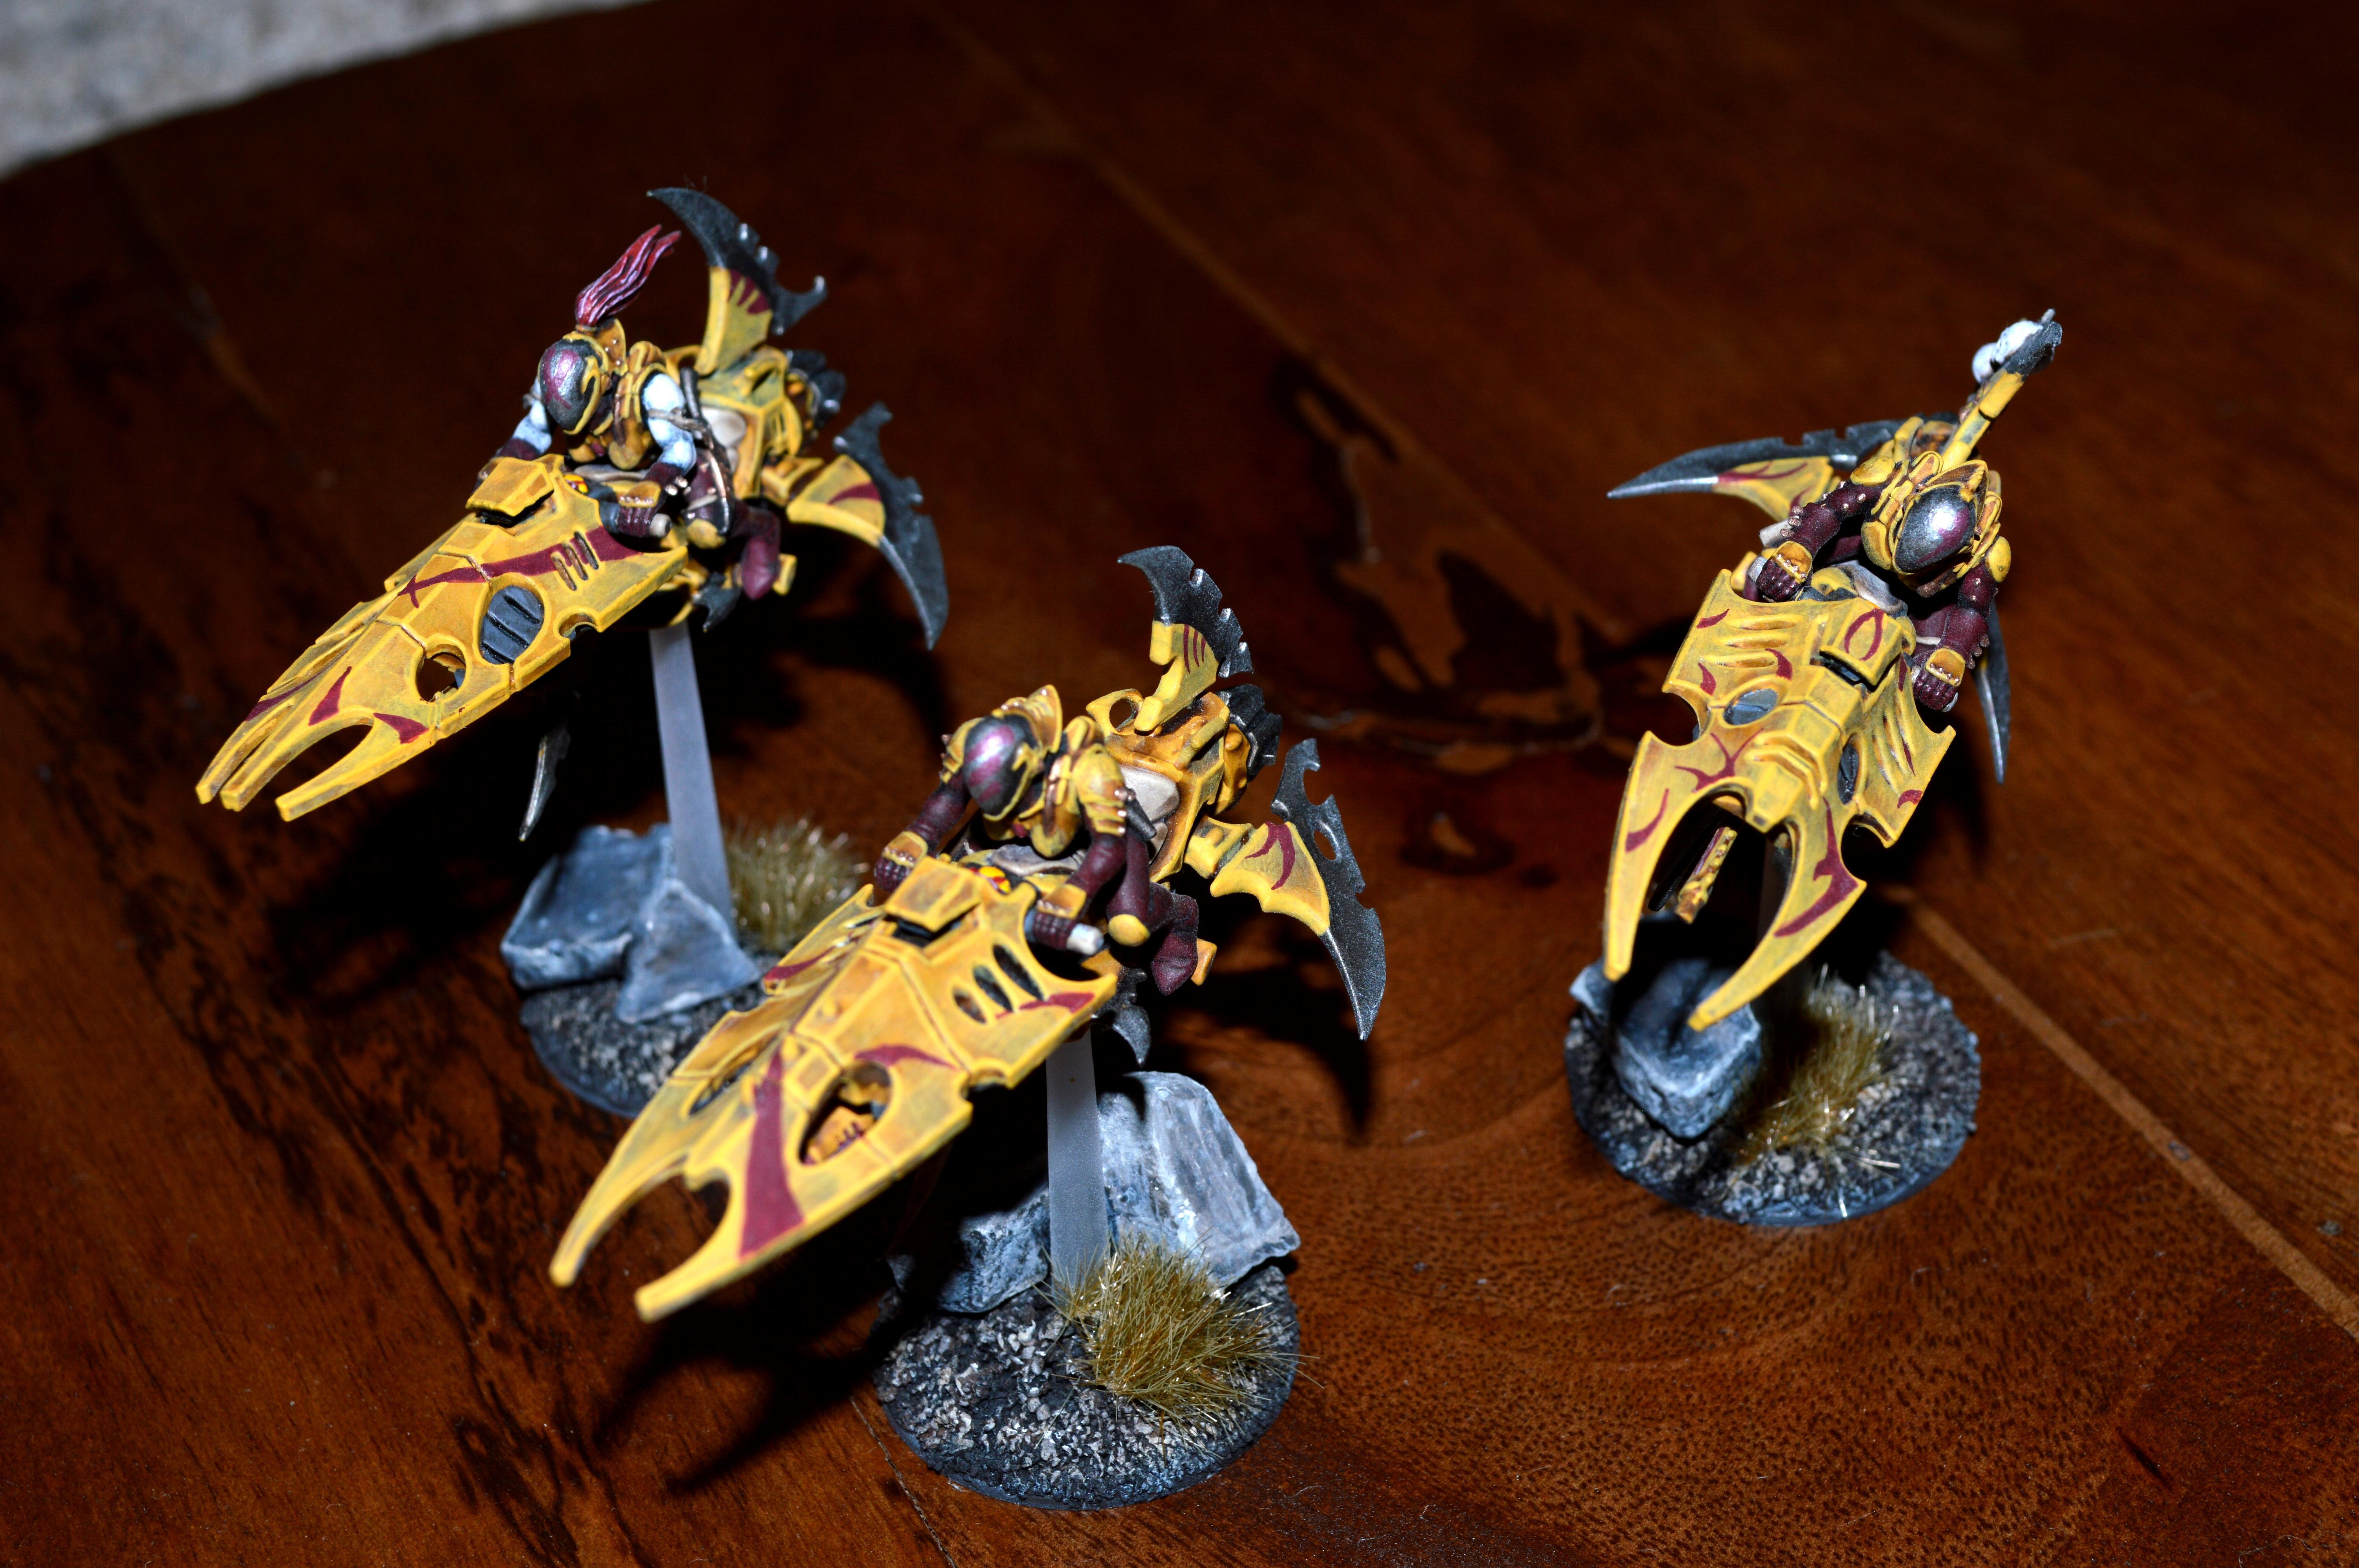 Dark Eldar, Drukhari, Jetbike, Reavers, Warhammer 40,000